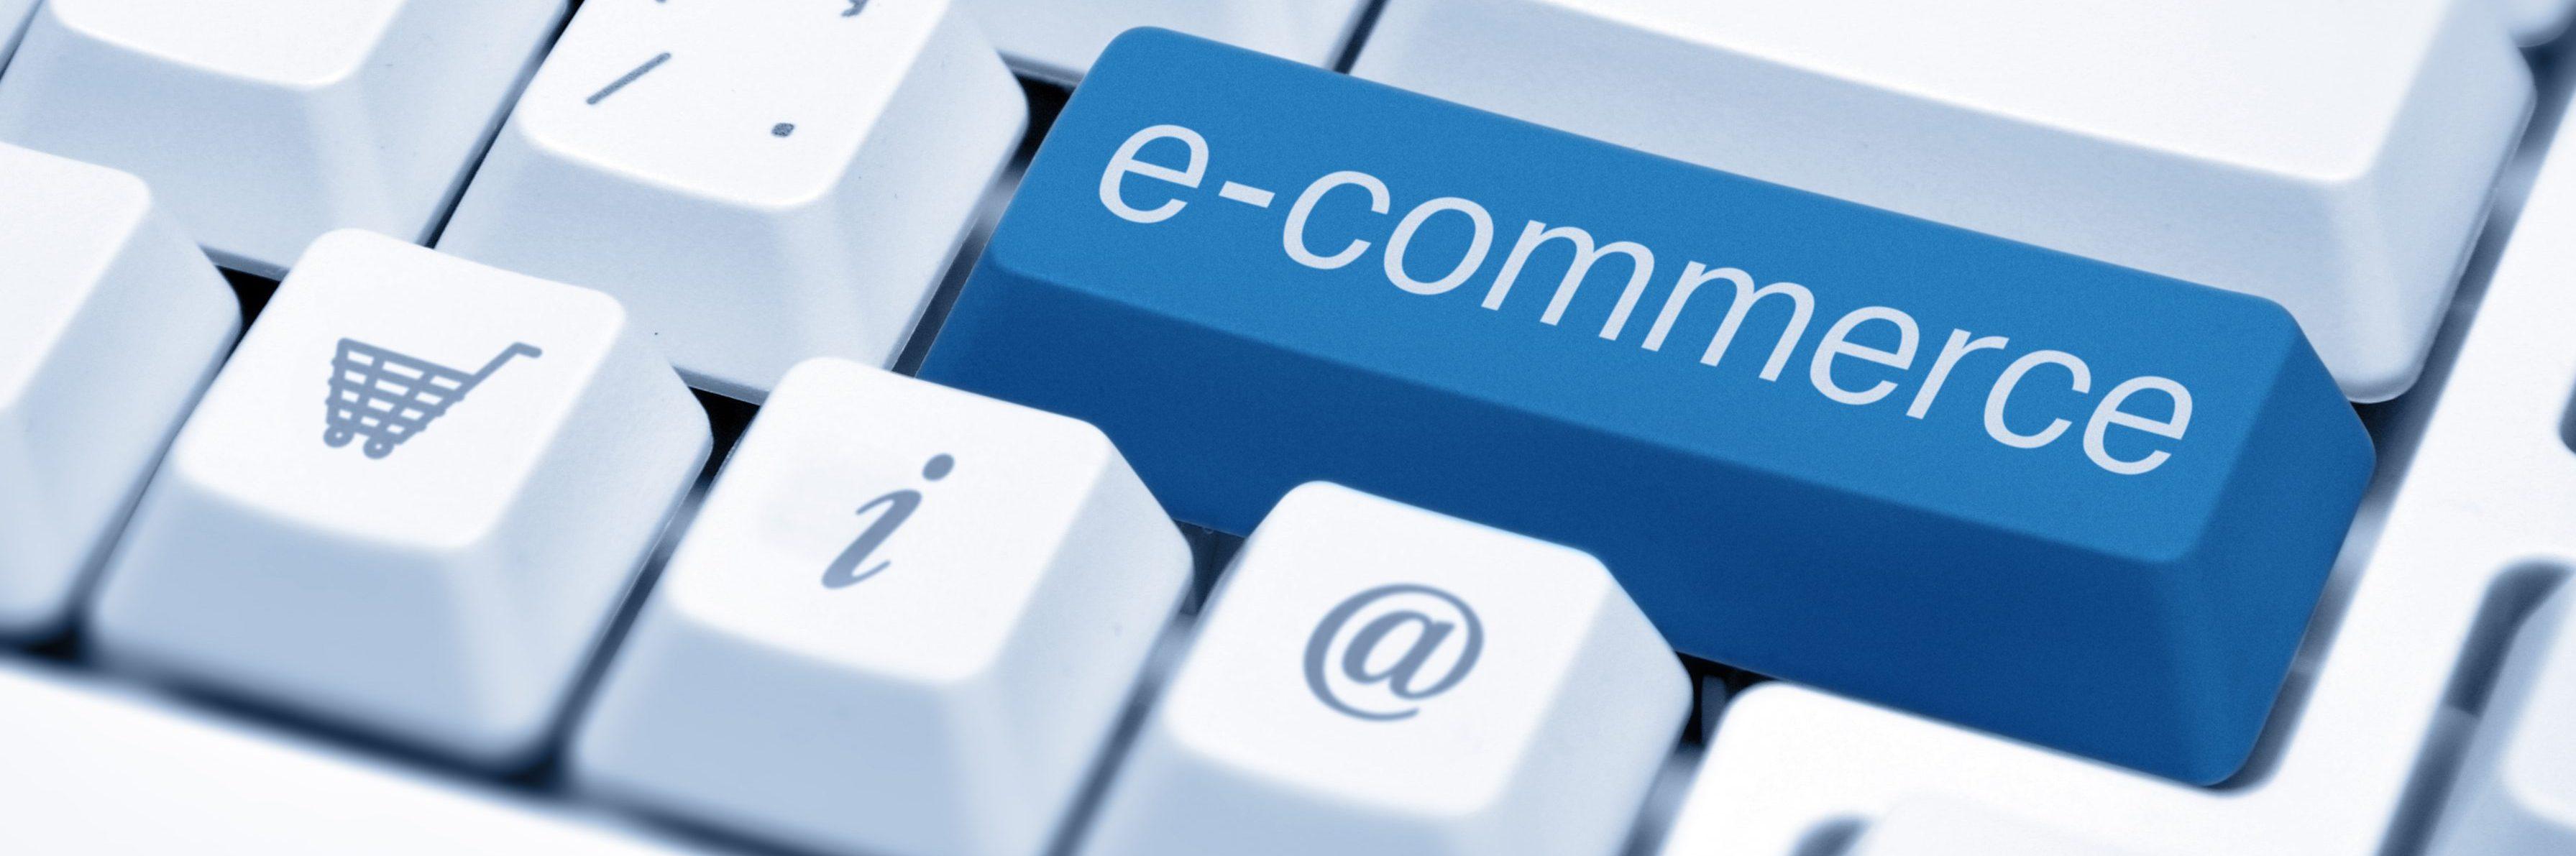 e-commerce key on keyboard